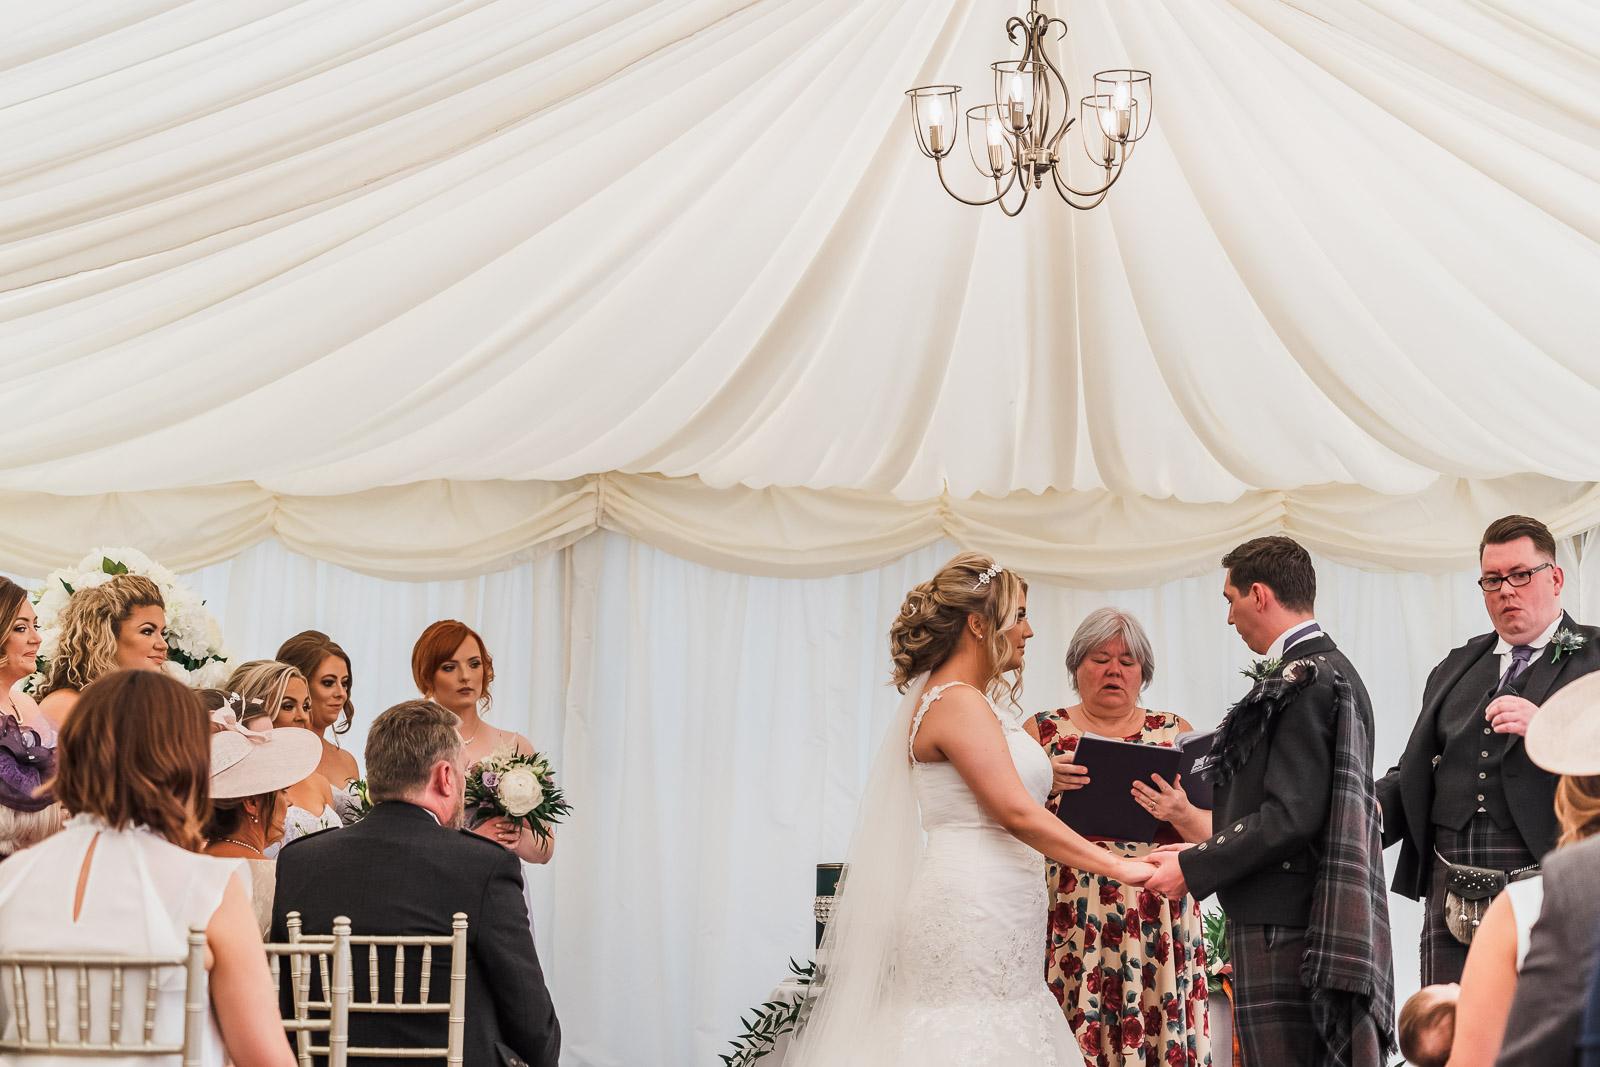 cornhill_castle_wedding_biggar_dearlyphotography (136 of 448).jpg